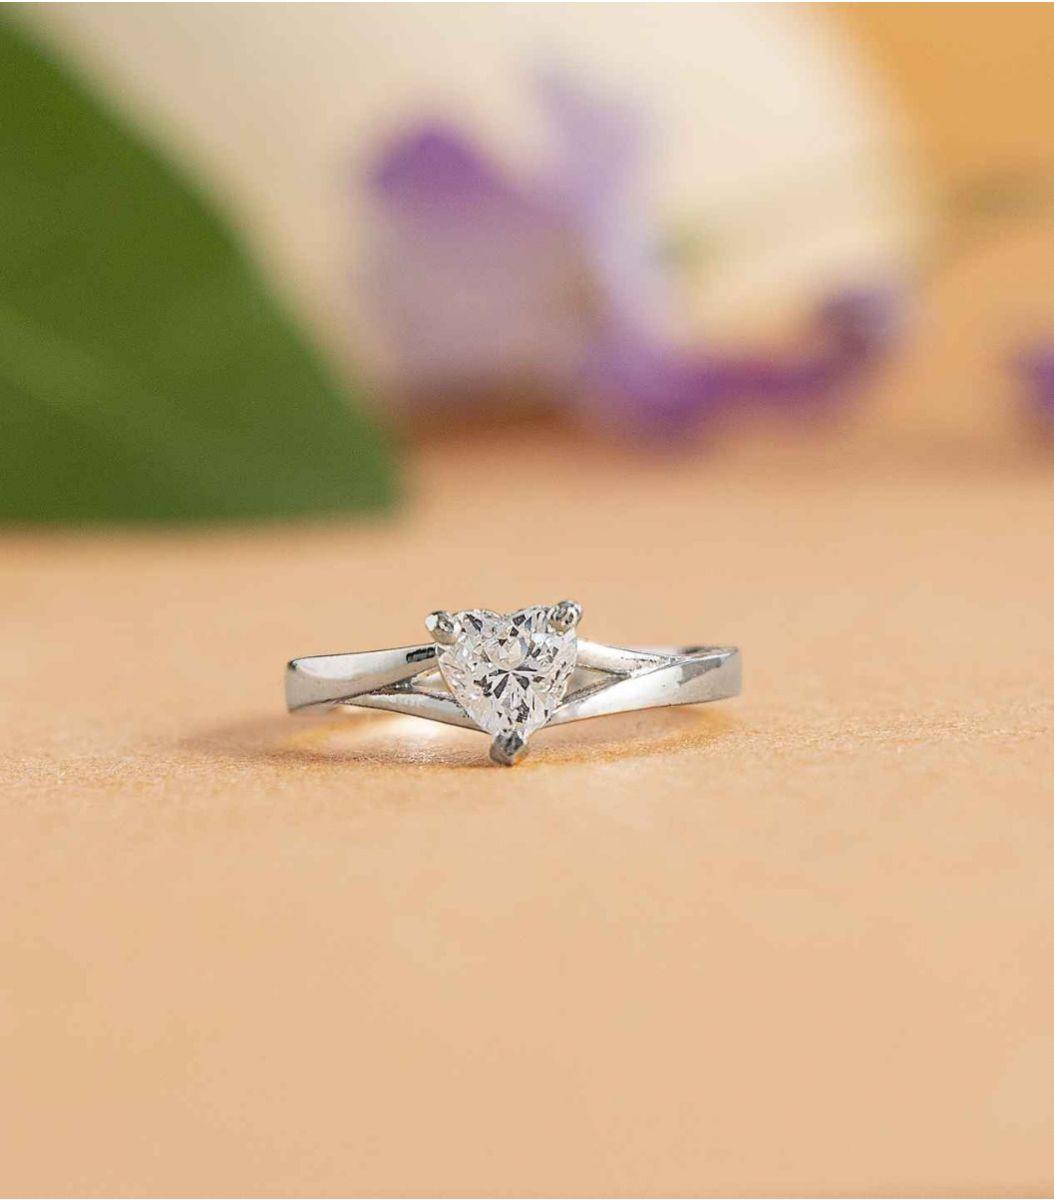 Silver Stone Finger Ring FJ1647787